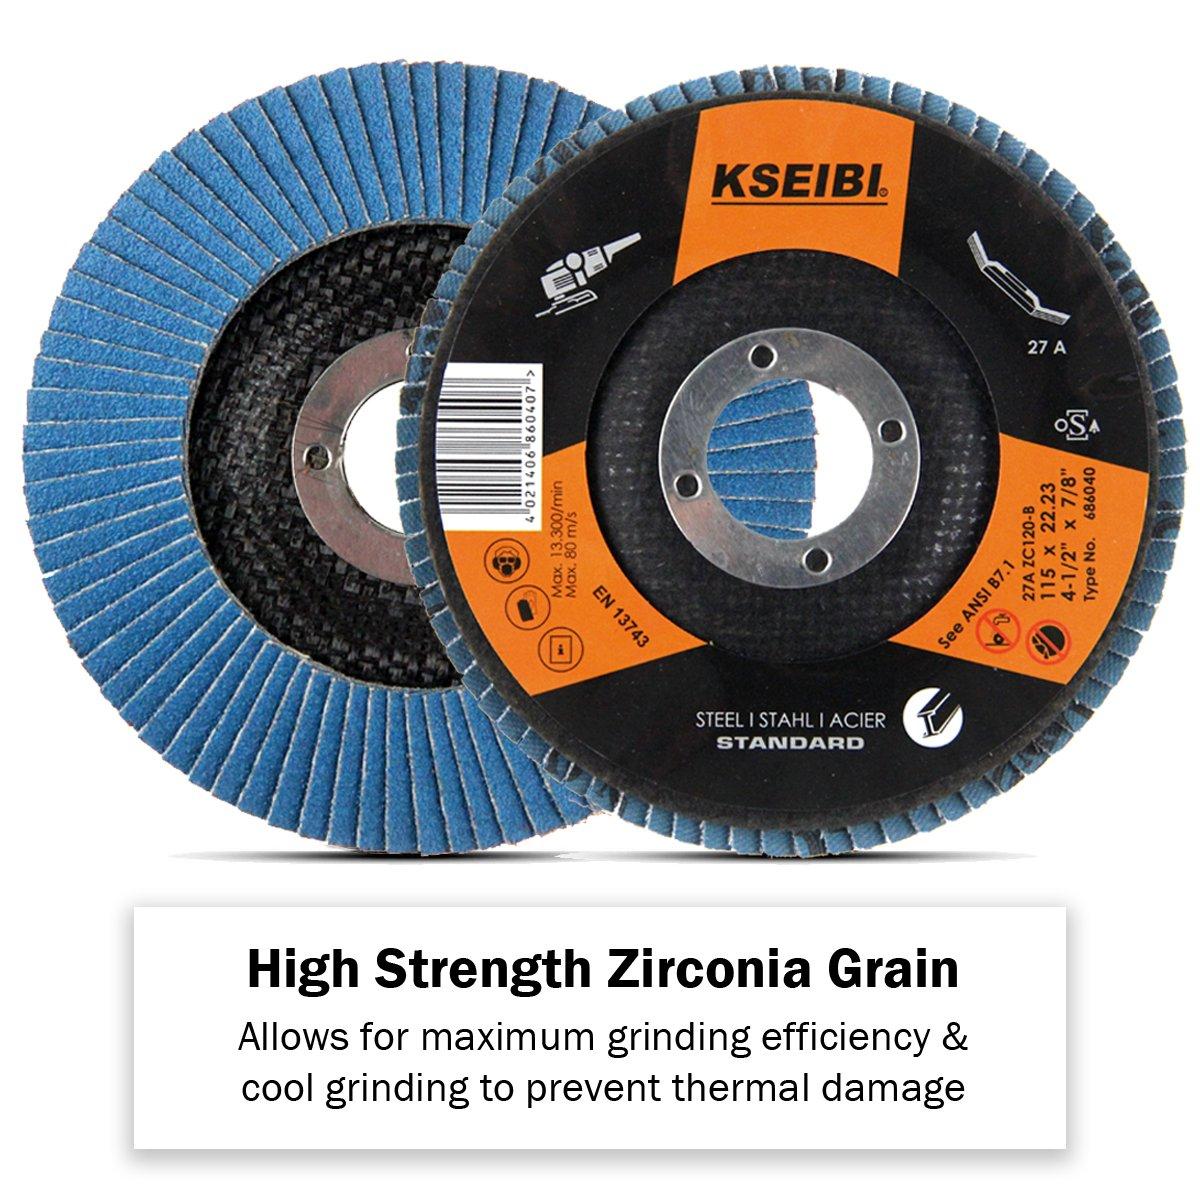 KSEIBI Zirconia Corundum 4 1/2 Inch Flap Disc Sanding Grinding Wheel (Grit #40, Blue) by KSEIBI (Image #2)